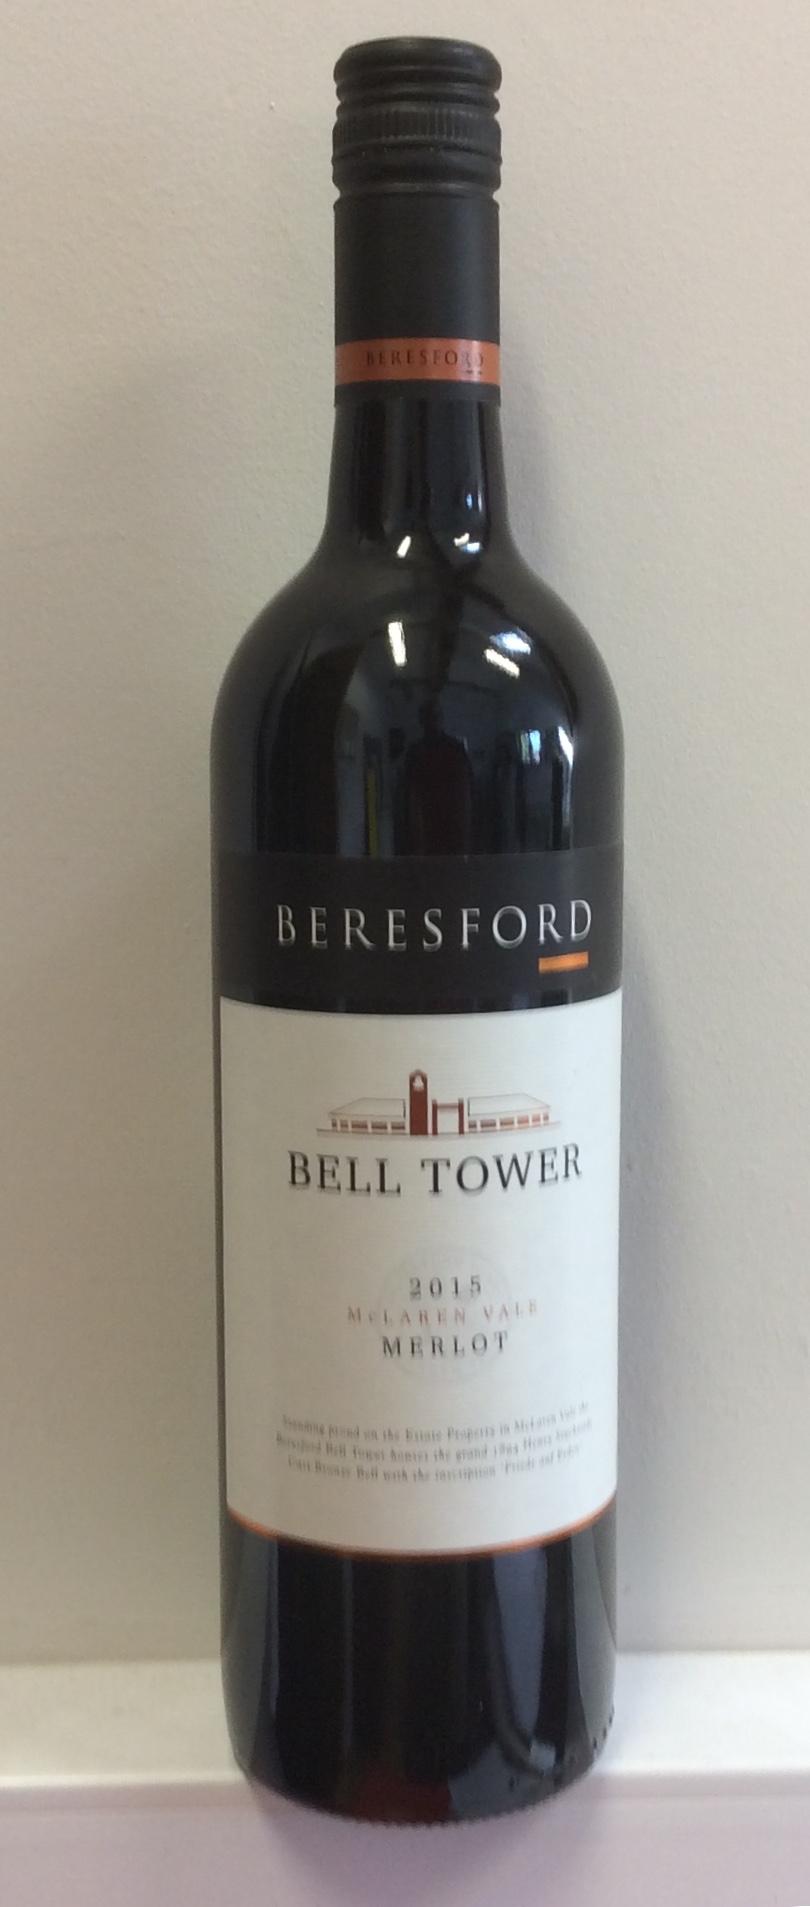 Bell Tower Merlot